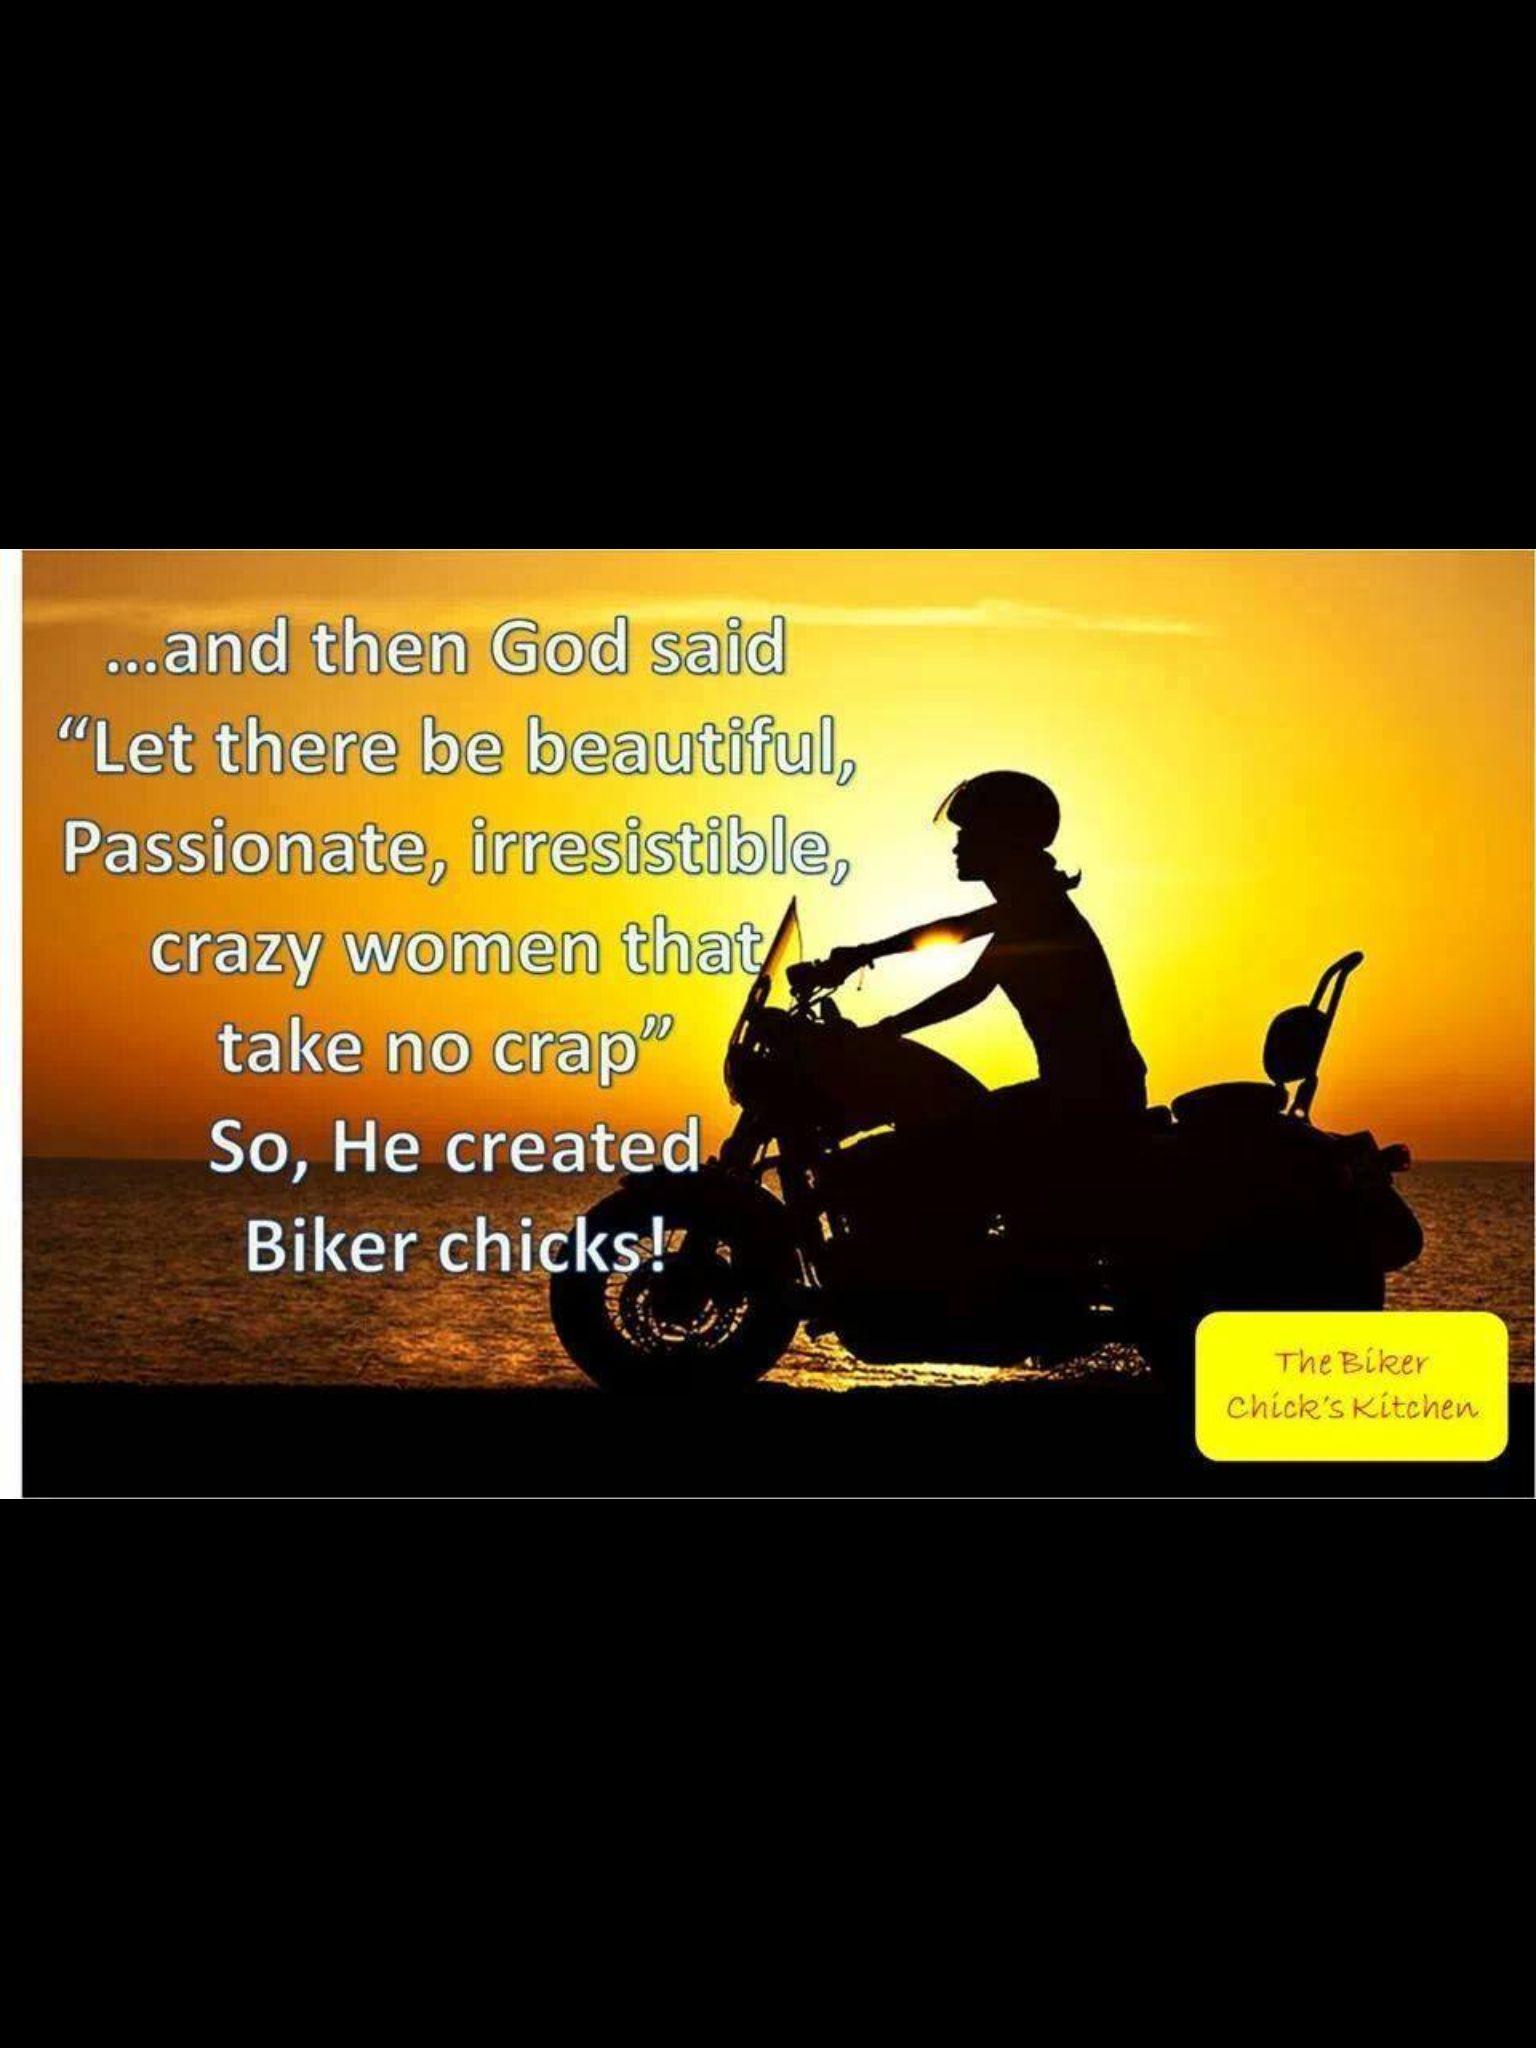 Harley Davidson Love Quotes Pinclaire Gottman On Biker Chick  Pinterest  Biker Chick And